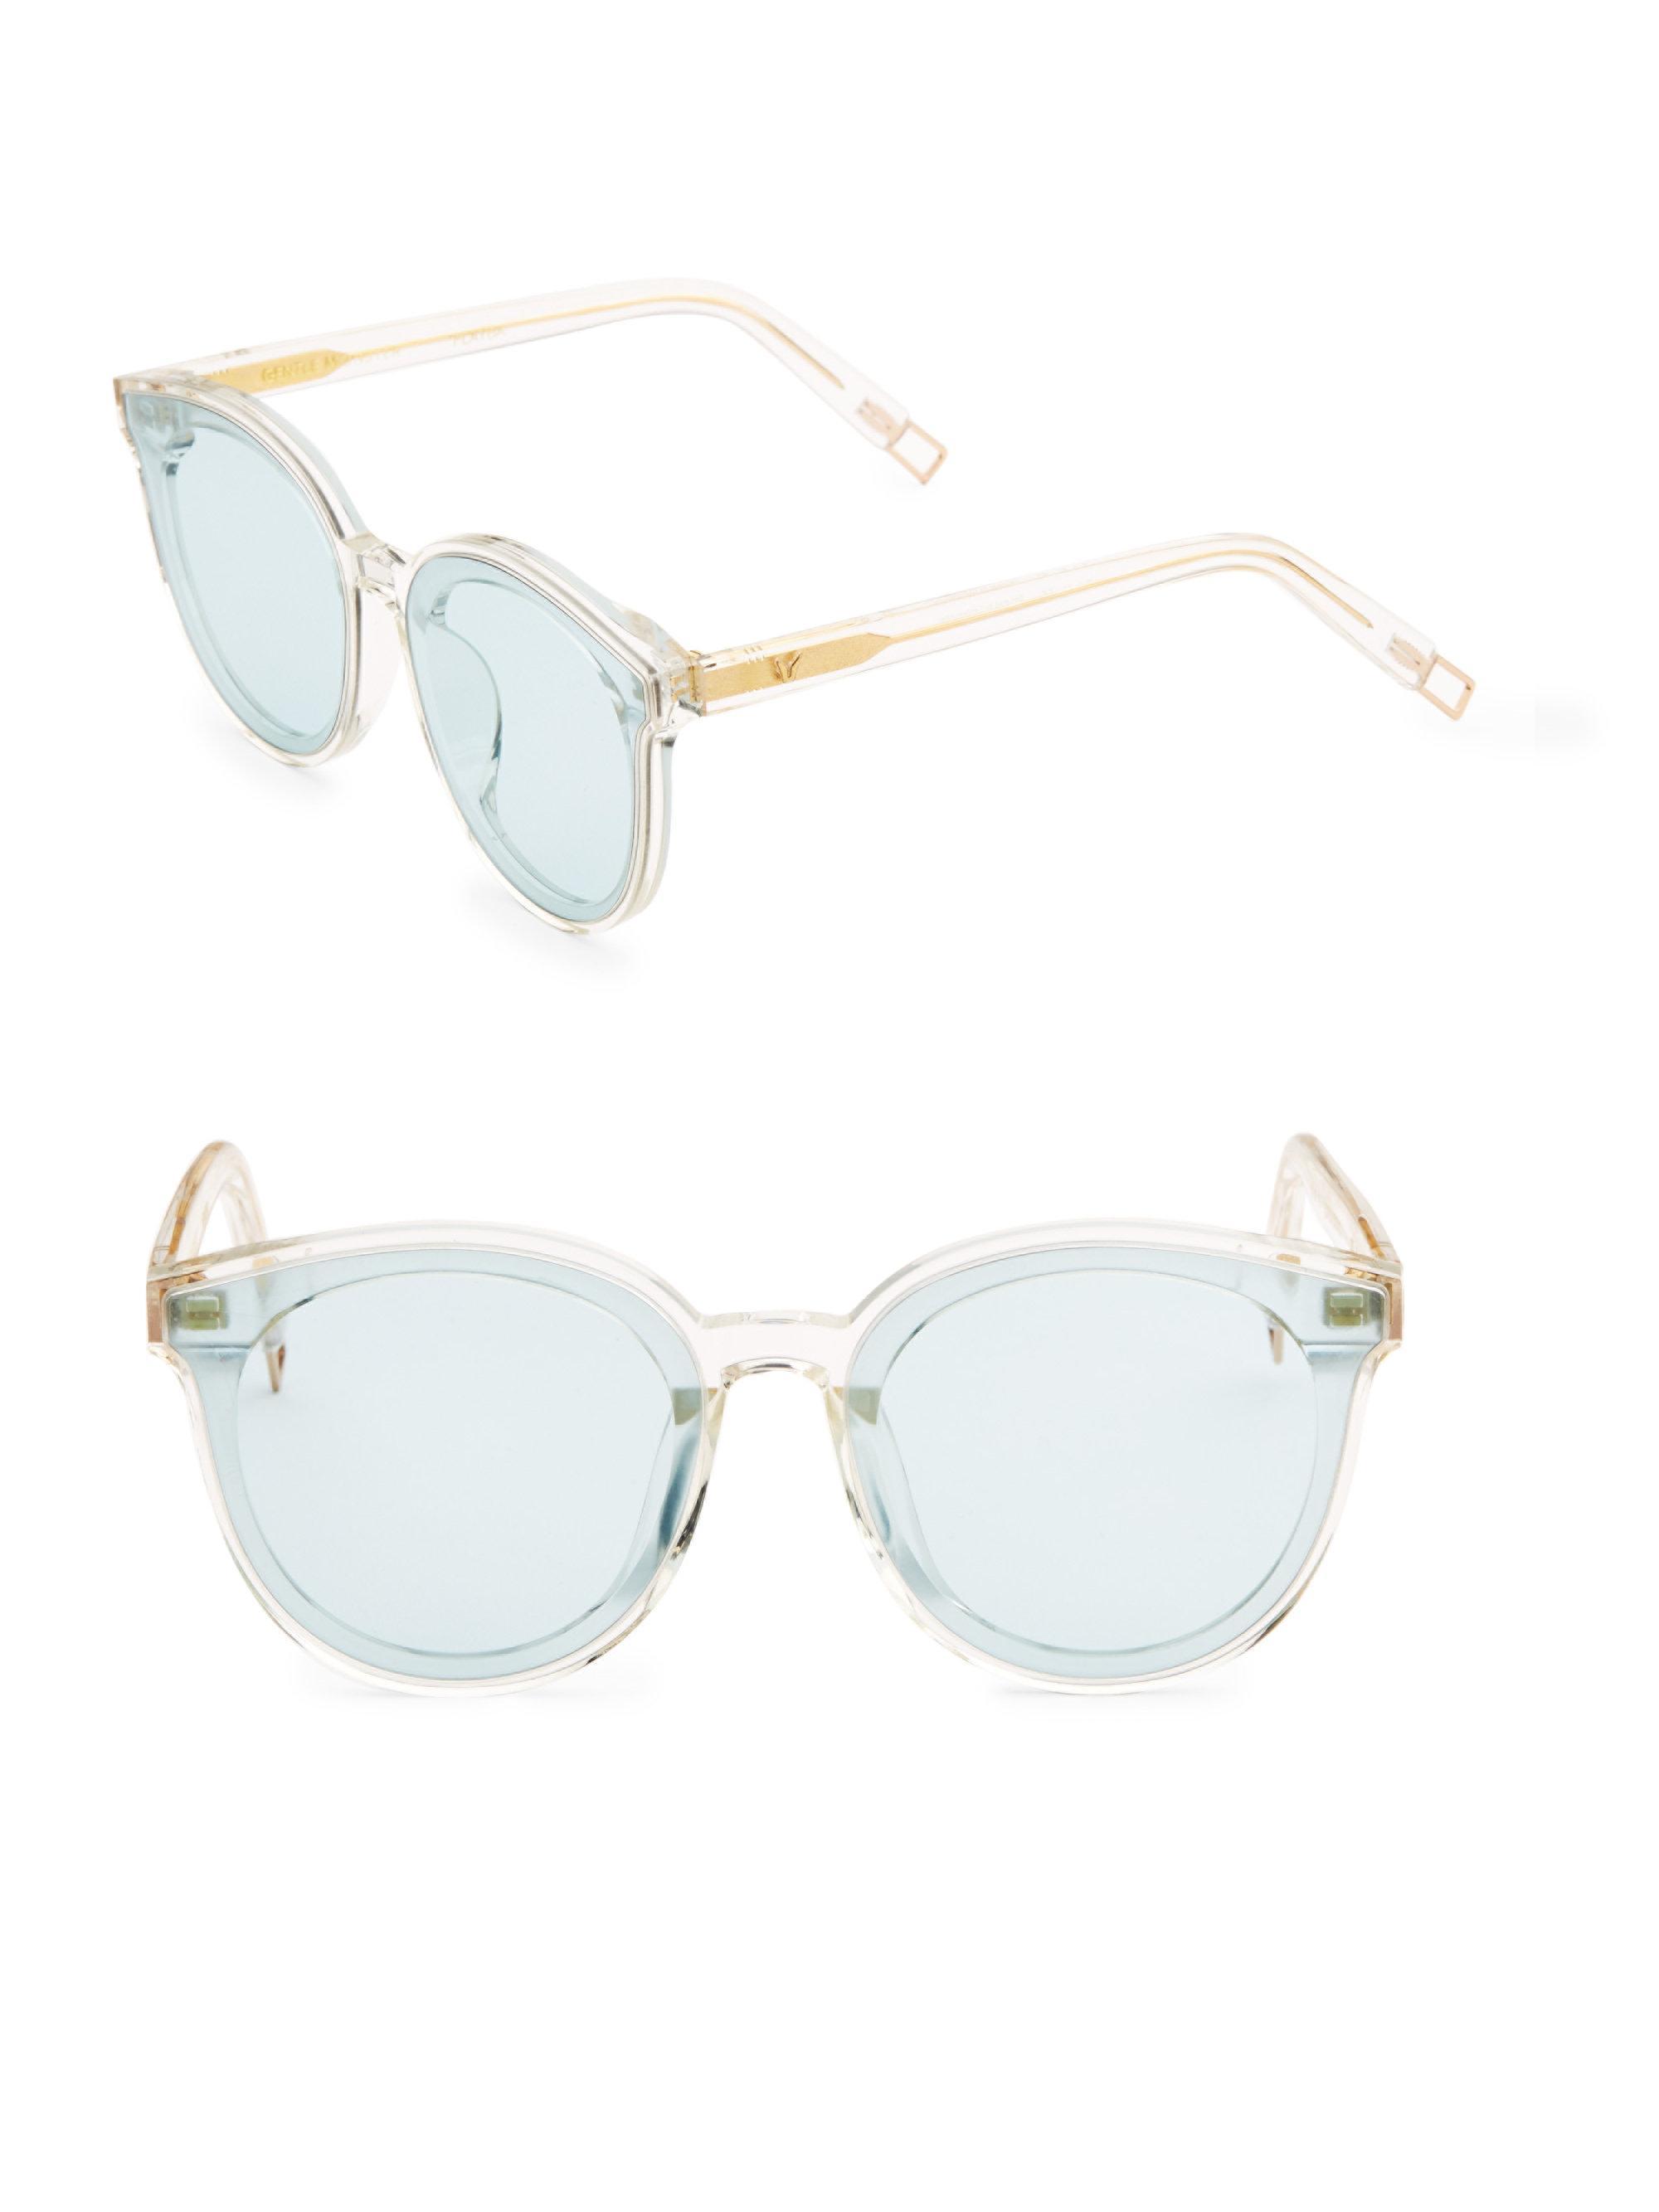 13be61bec9483 Gentle Monster Peter 61mm Wayfarer Sunglasses in Blue - Lyst